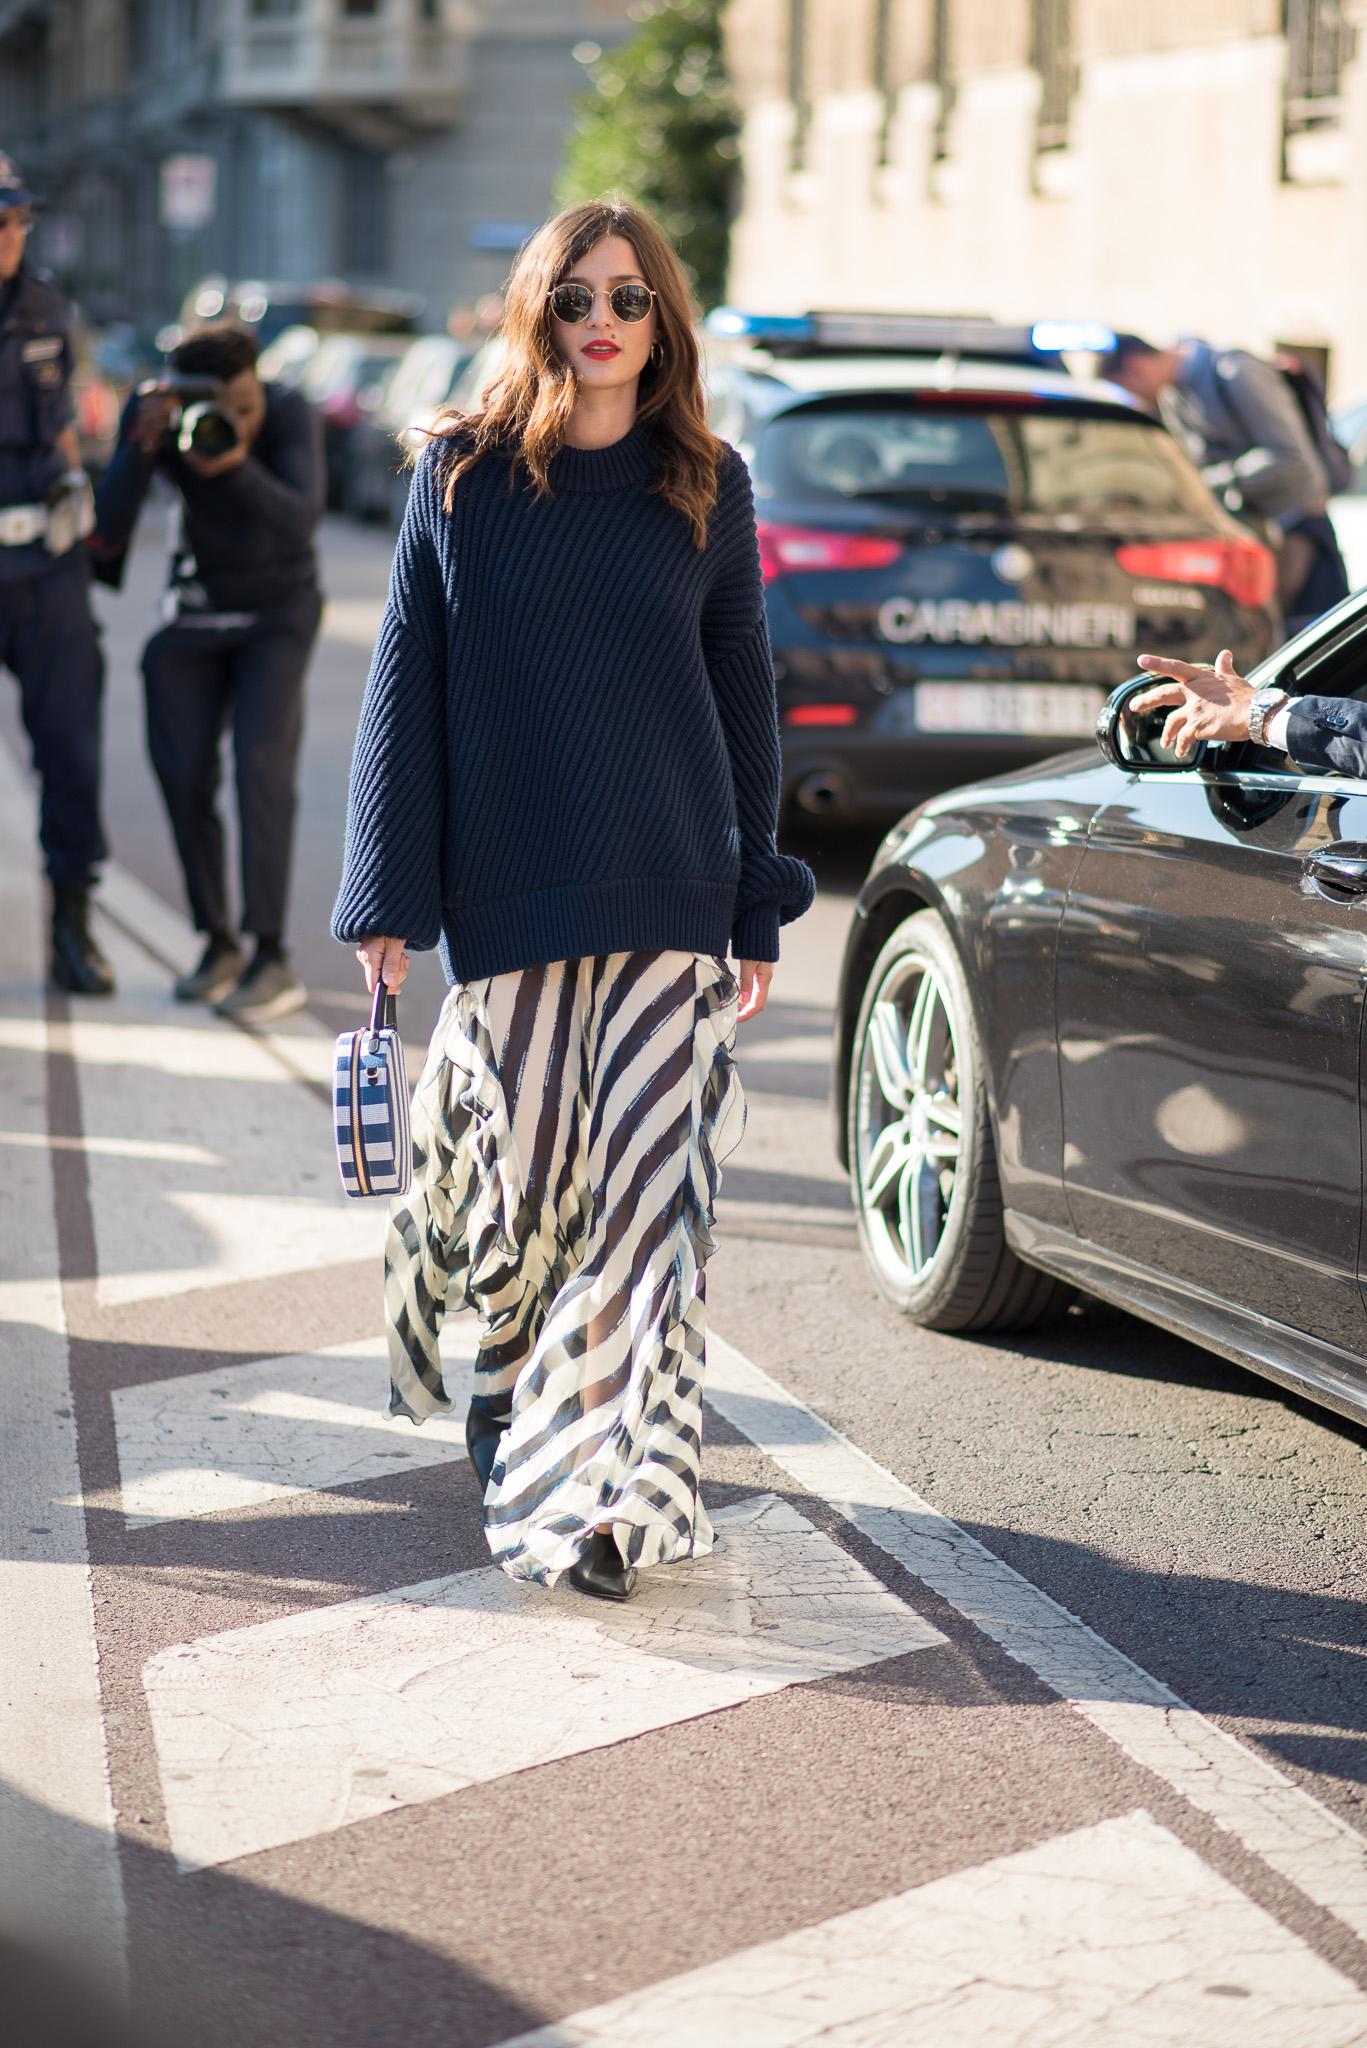 Eleonora Carisi Alberta Ferretti Milan Fashion Week September 2017 Photography Annika Lagerqvist www.annikasomething.com